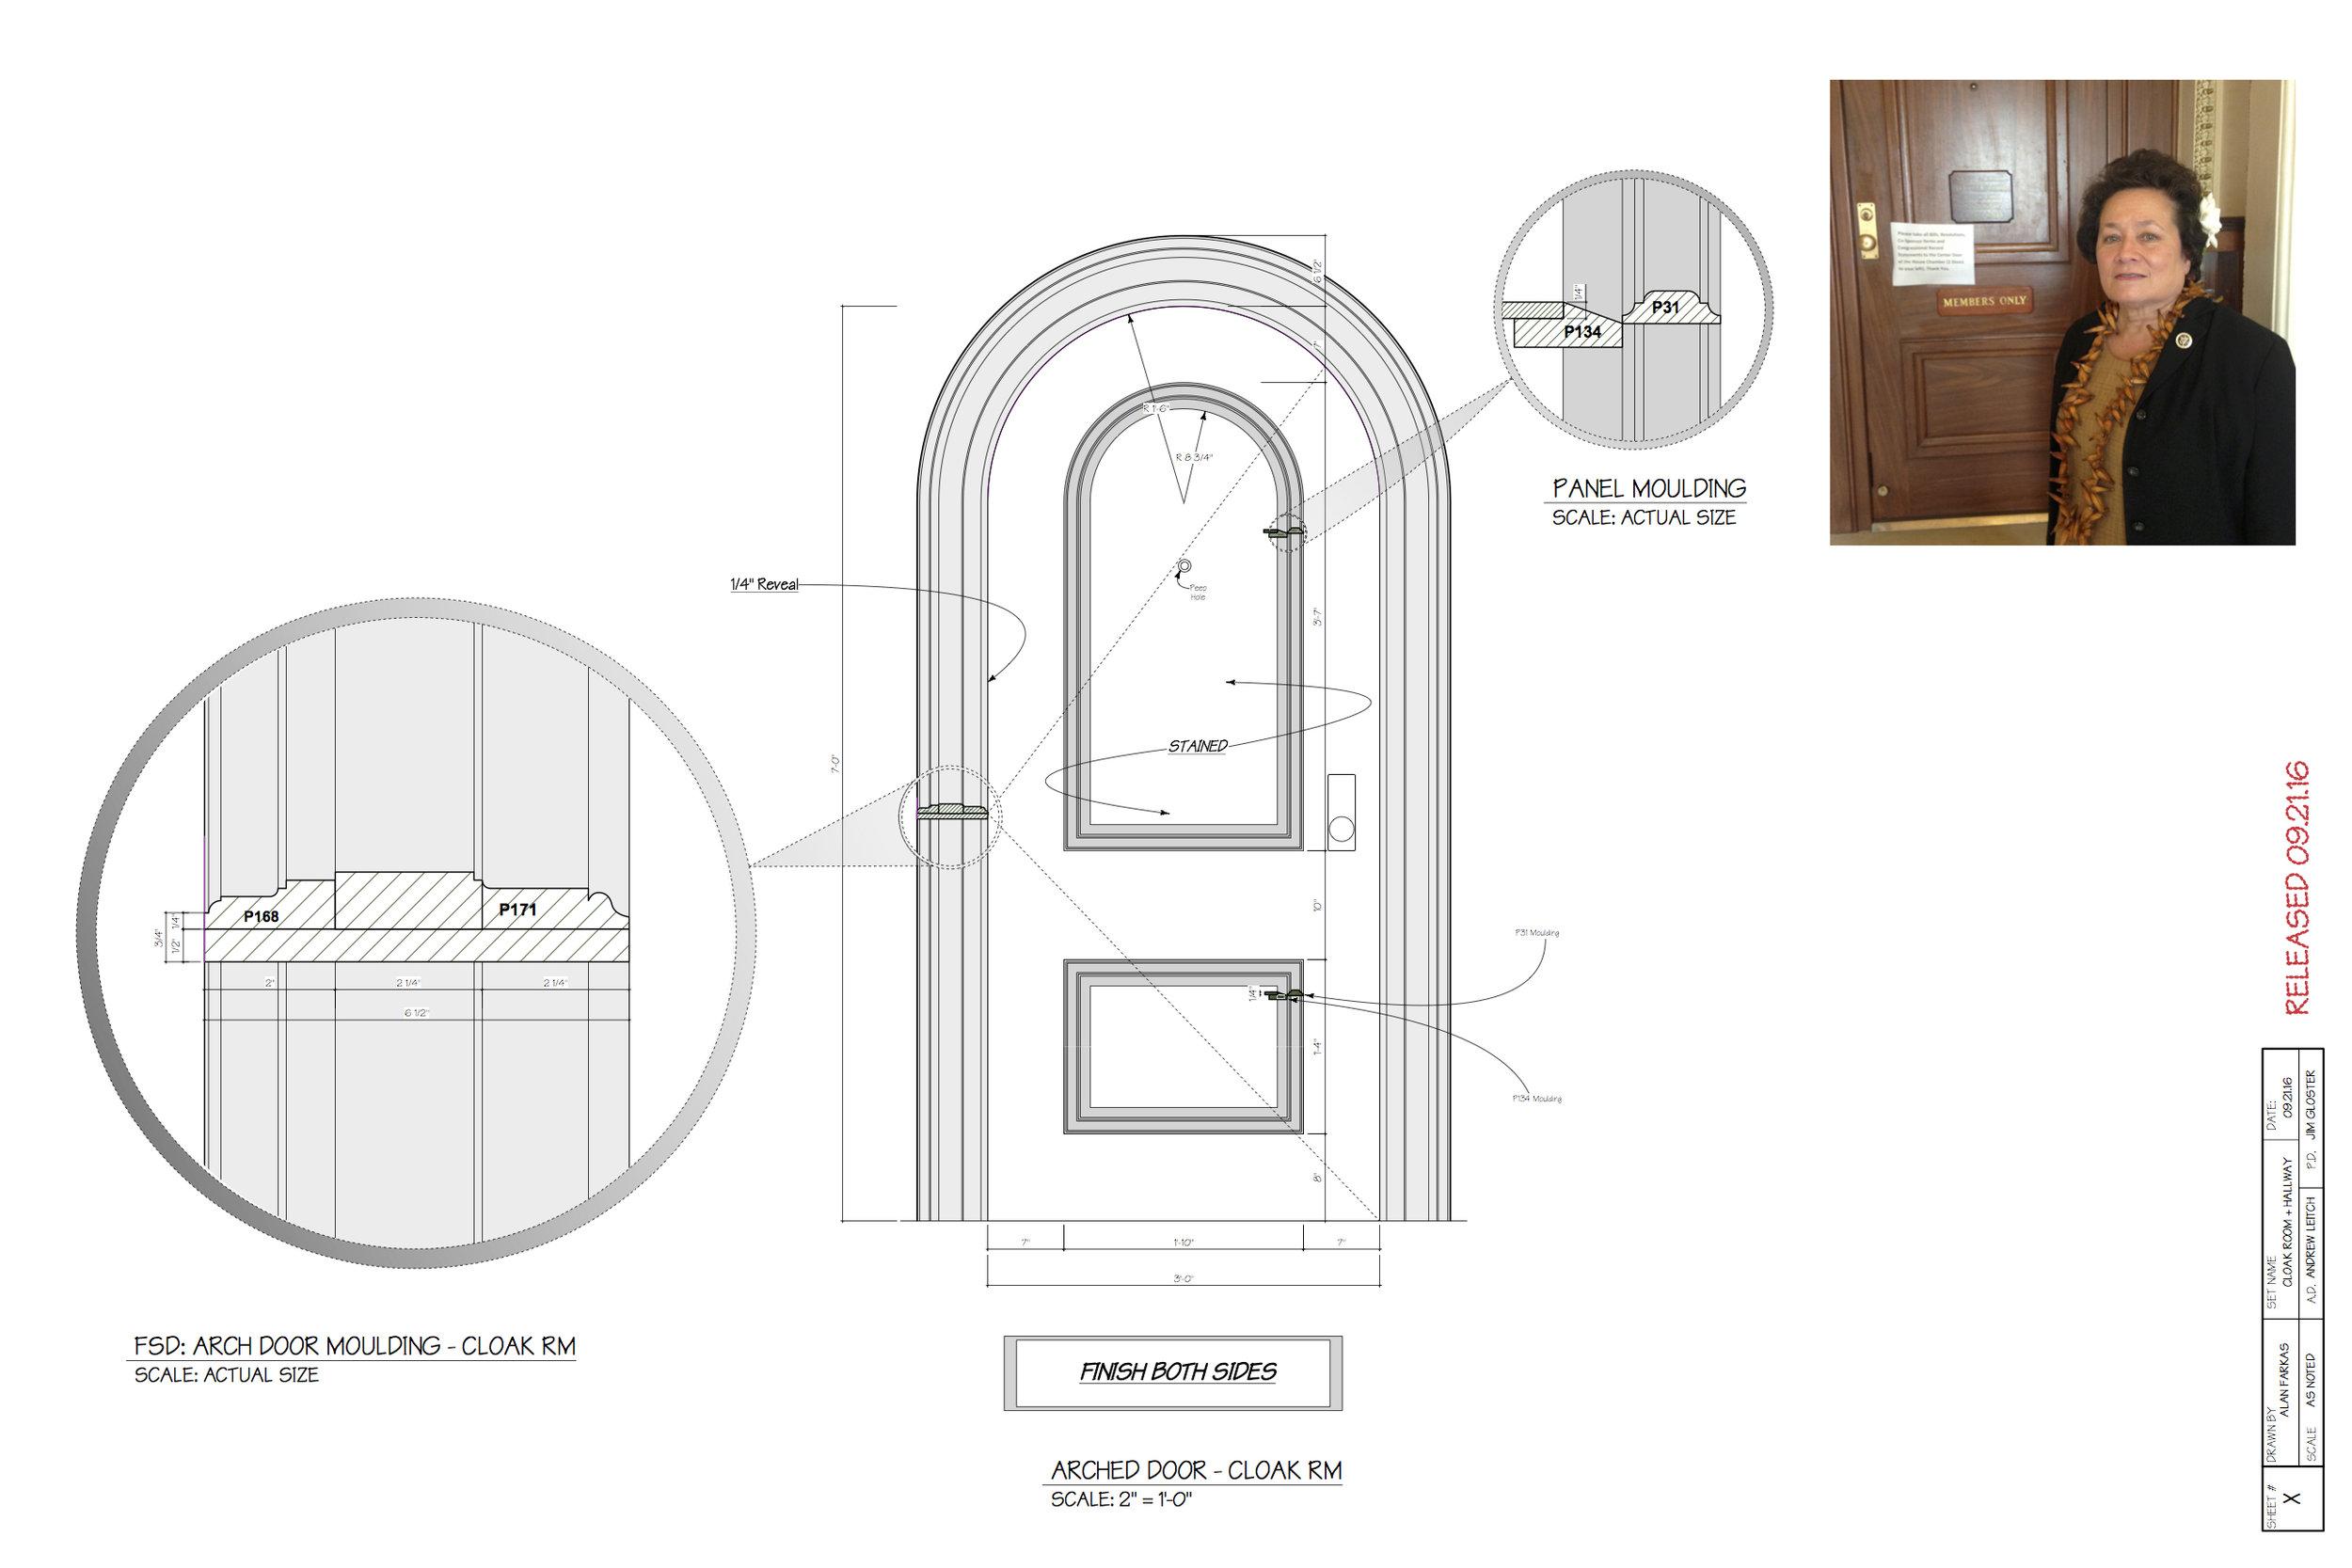 CLOAK ROUNDED DOOR_v02_RELEASE 09.21.16.jpeg